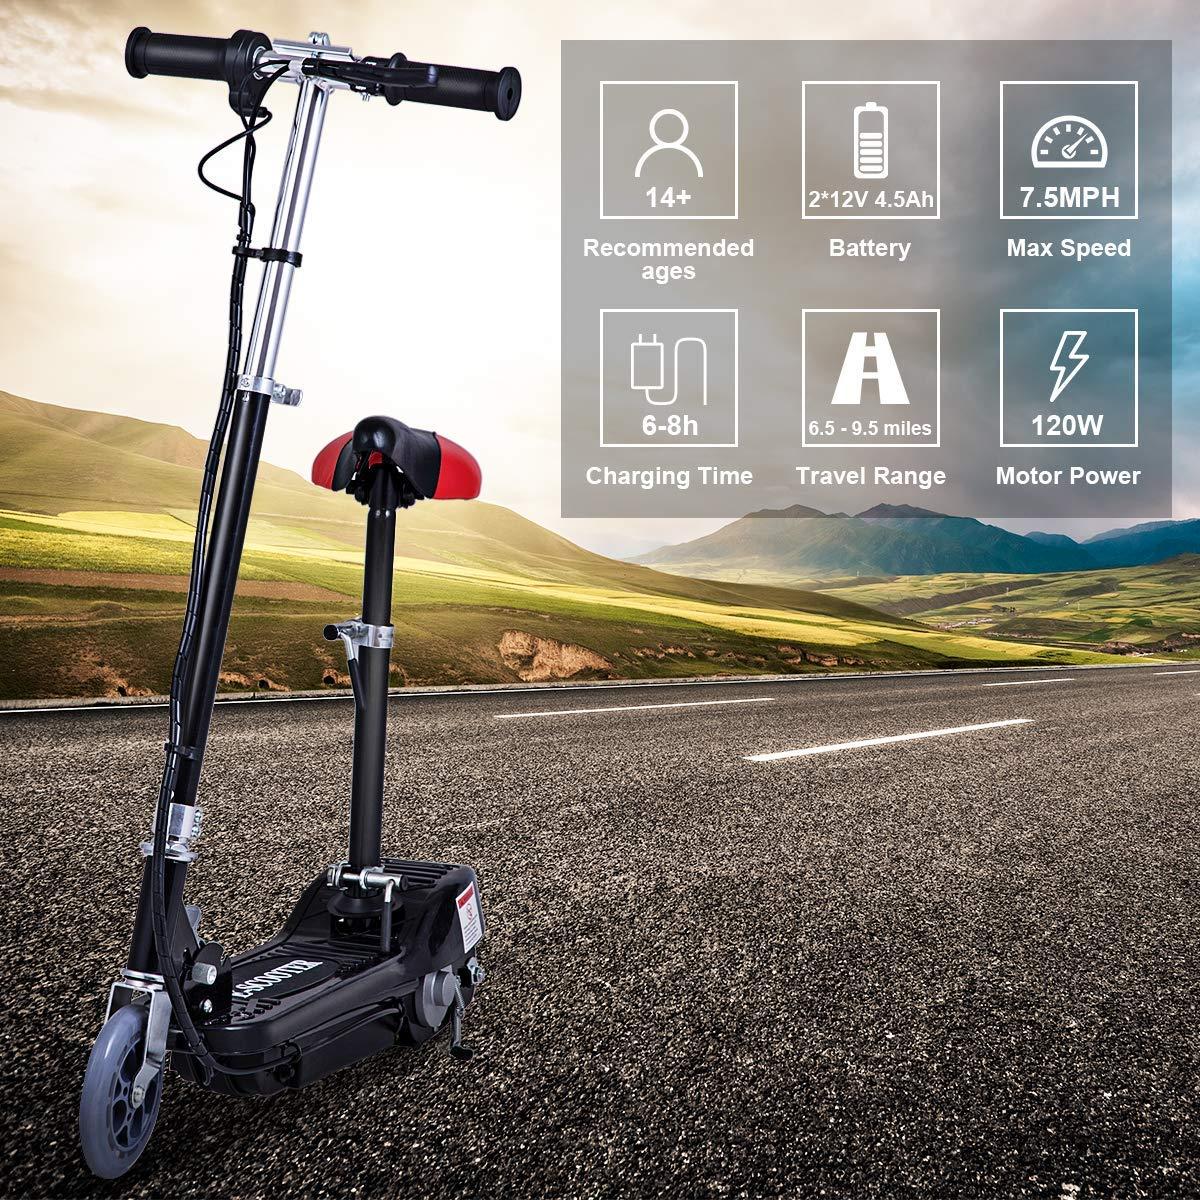 Amazon.com : Costzon Electric Scooter, 24 Volt Lightweight ...